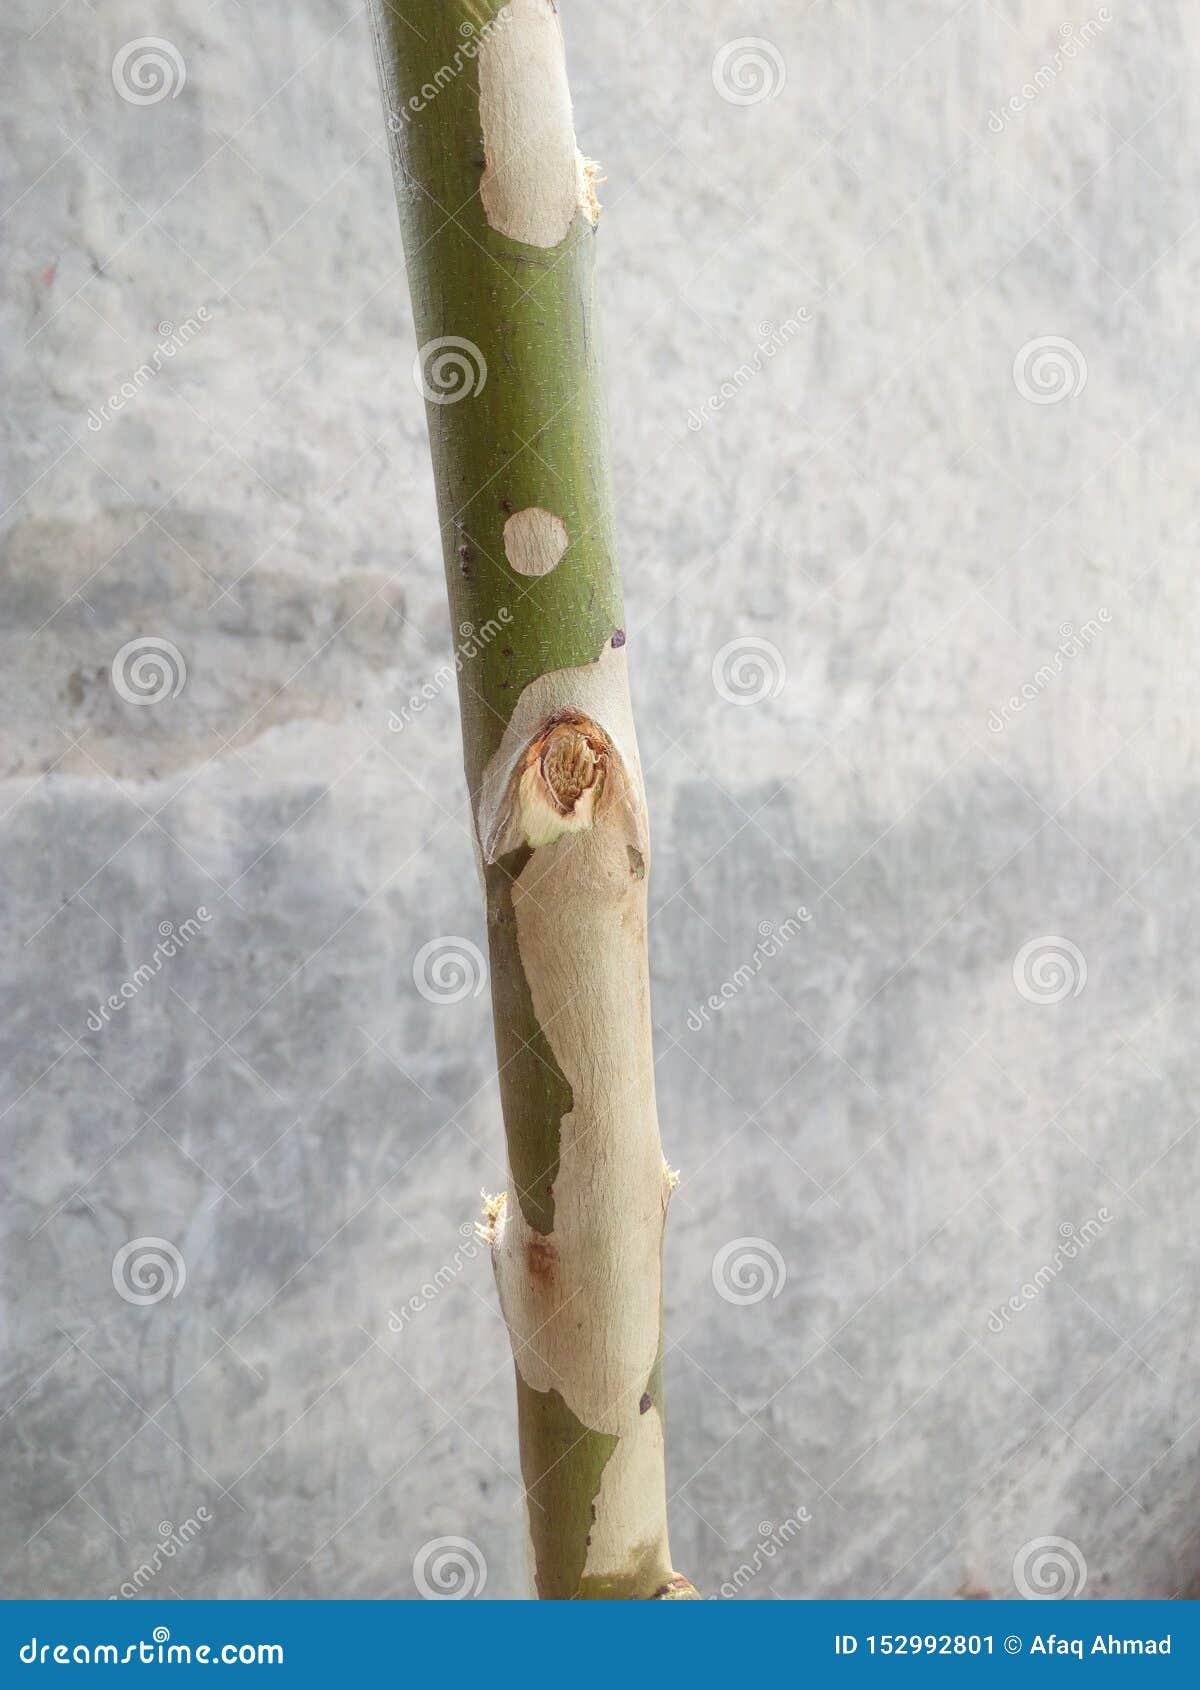 A bough of Poplar